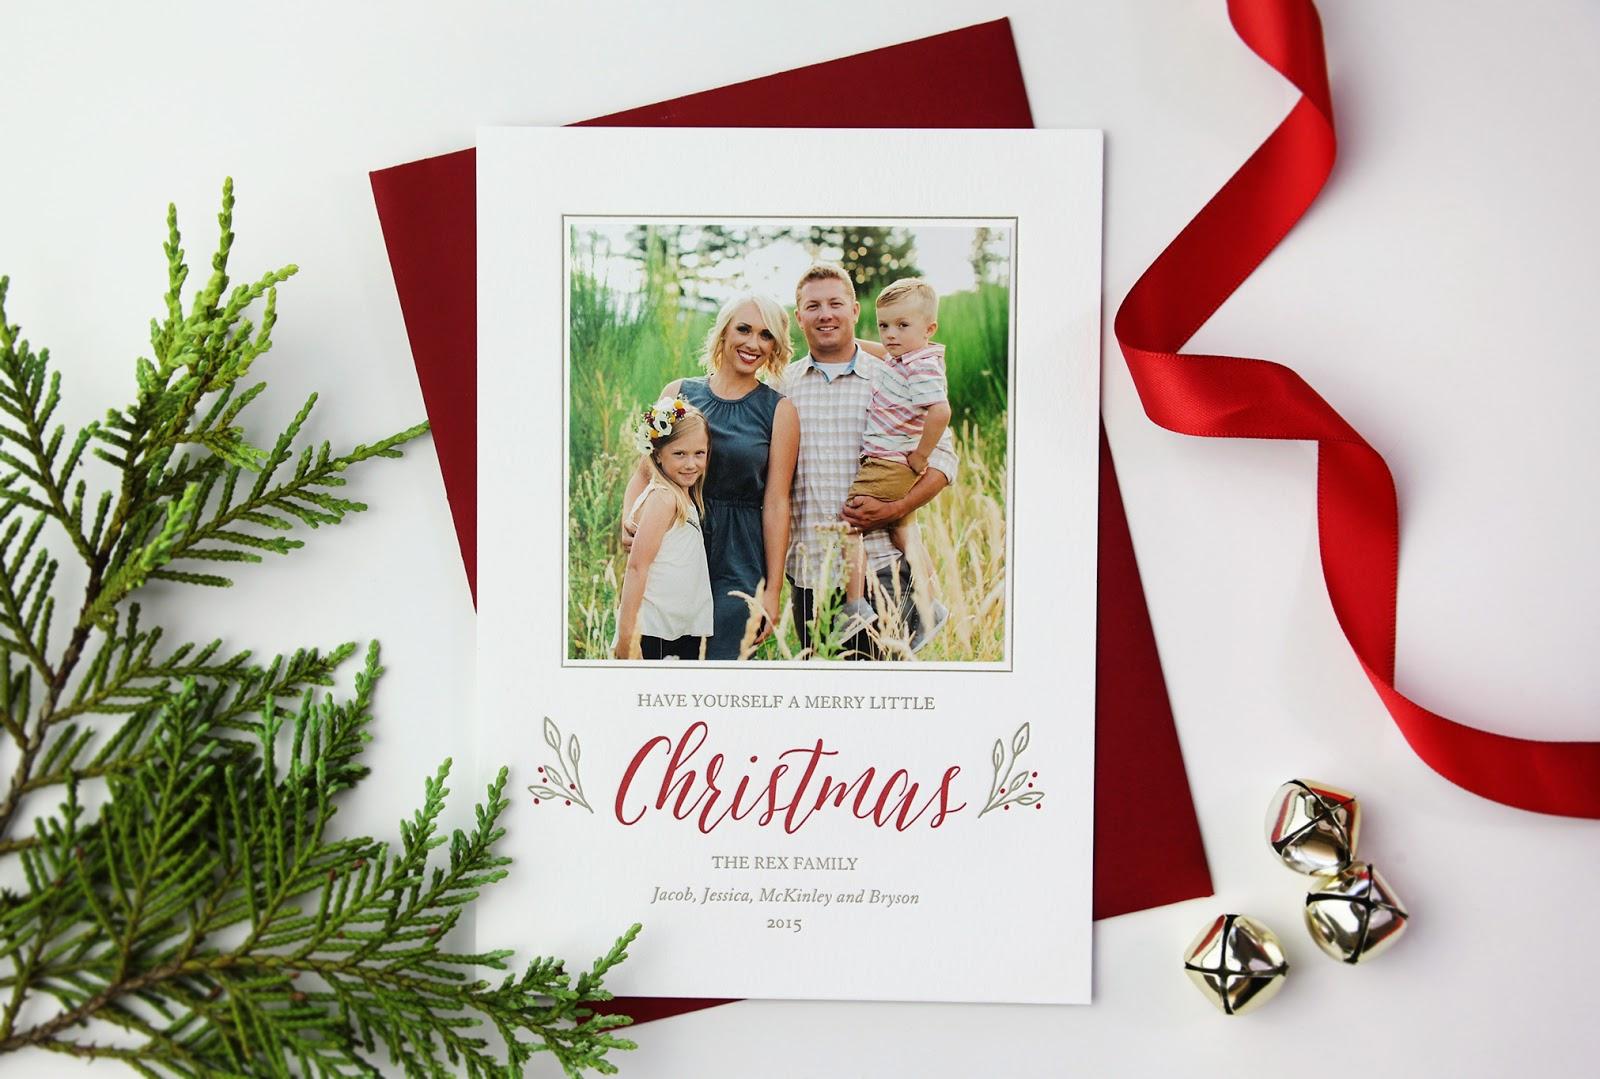 Letterpress Holiday Cards | Sweetly Said Press